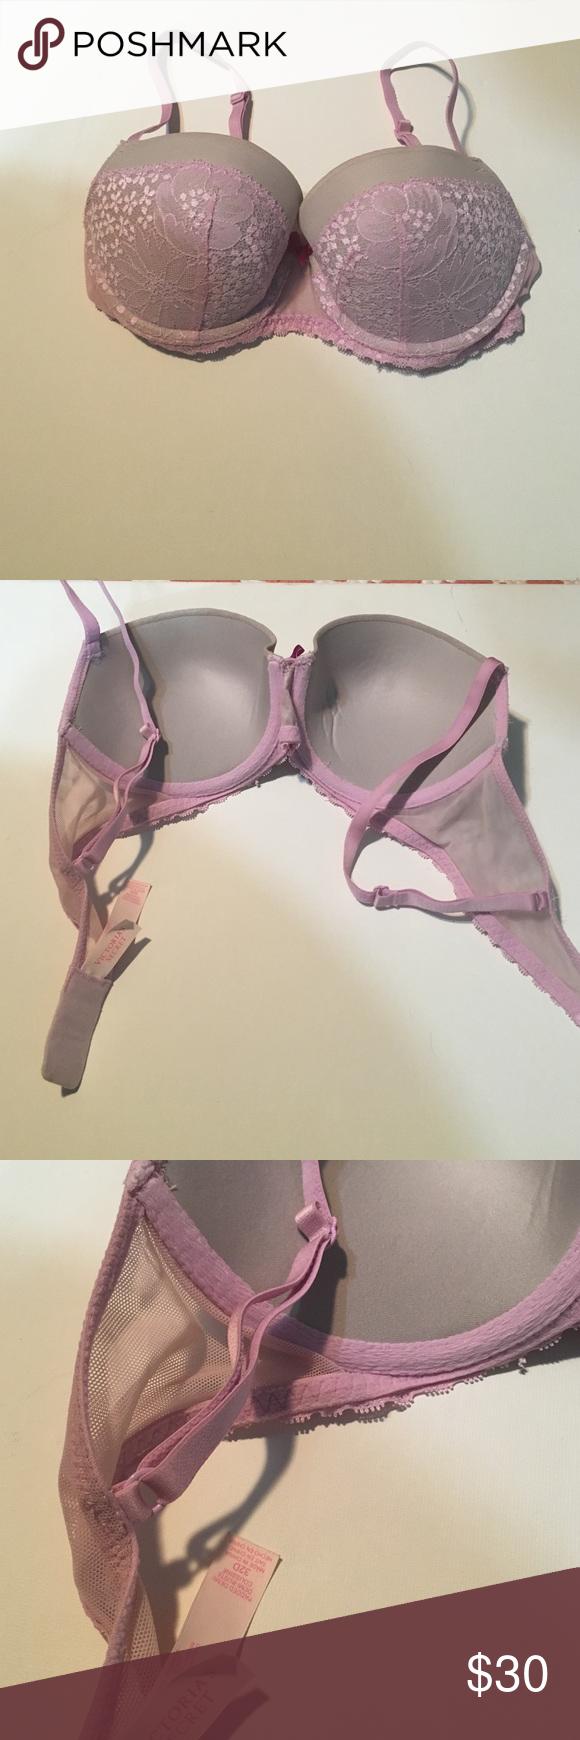 Victoria secret bra 32d NWOT Victoria's Secret brawl padded Demi 32d NWOT Victoria's Secret Intimates & Sleepwear Bras